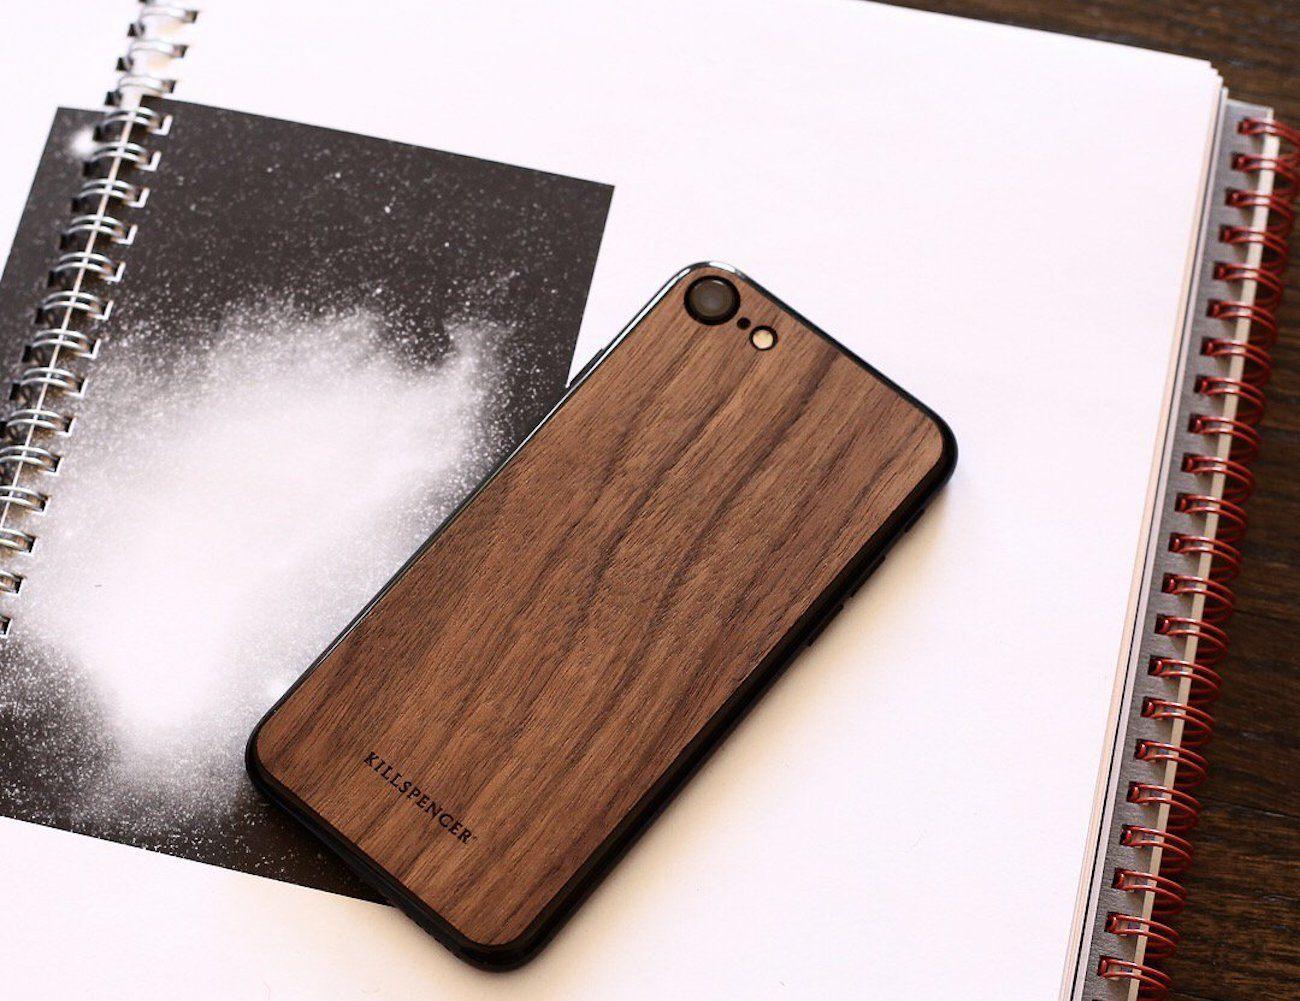 new style 4e3f5 f897e Veil Wood iPhone 7 Skin from Killspencer